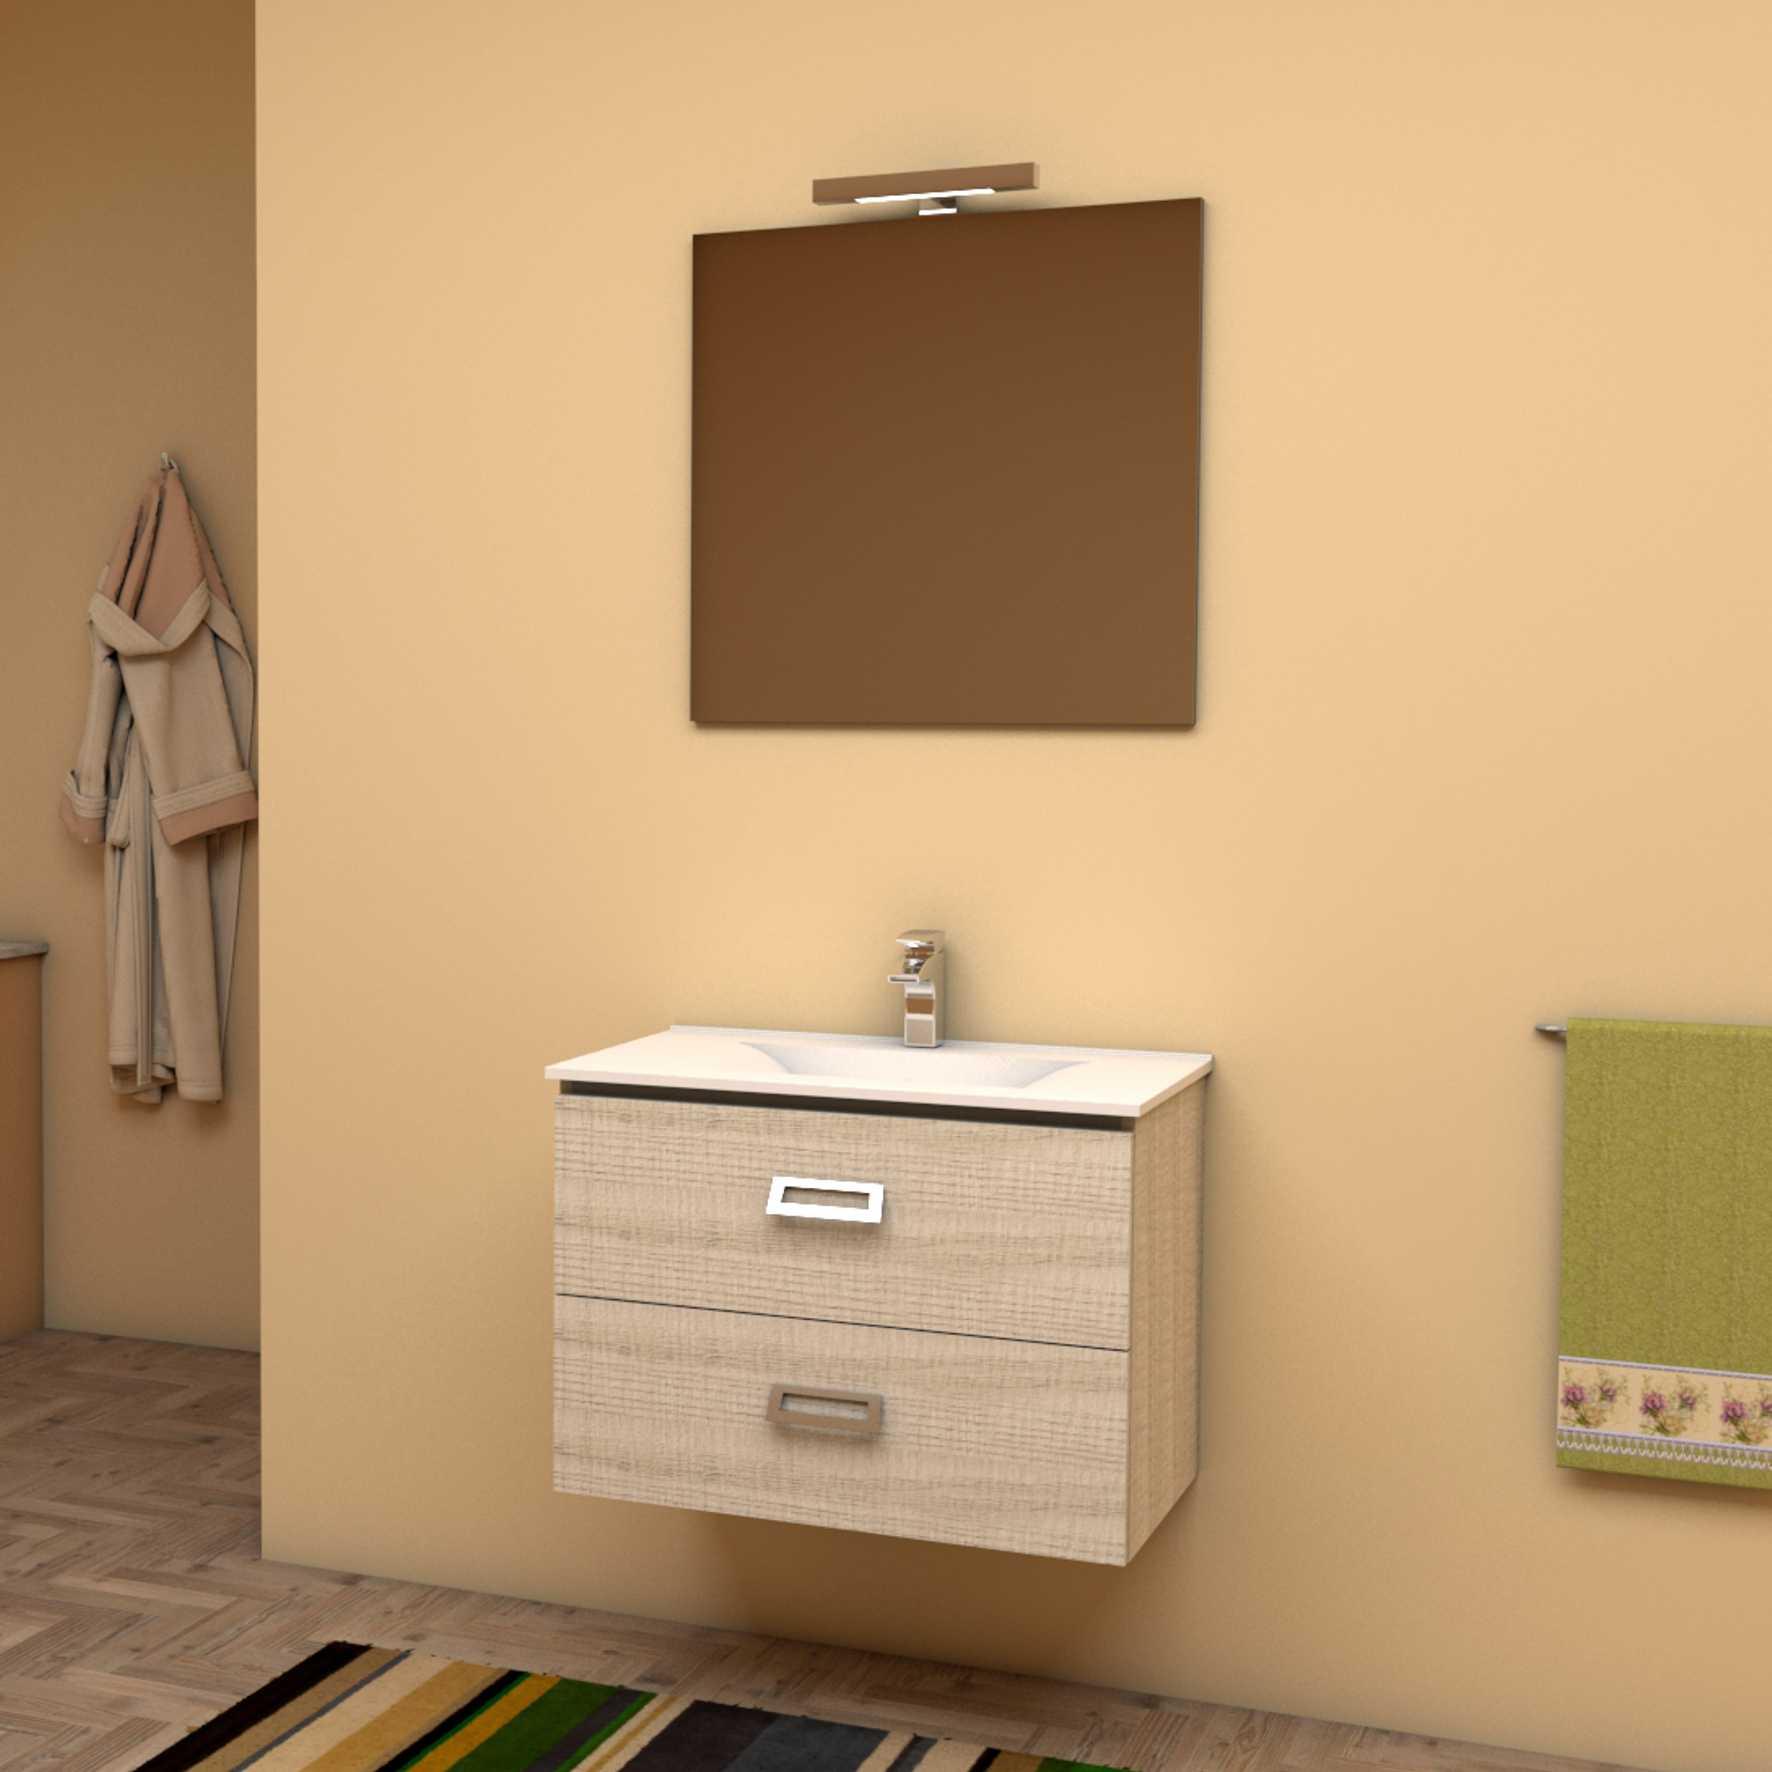 Mobile bagno sospeso QUADRO 75x46 cm frassino tranchè con lavabo in ceramica